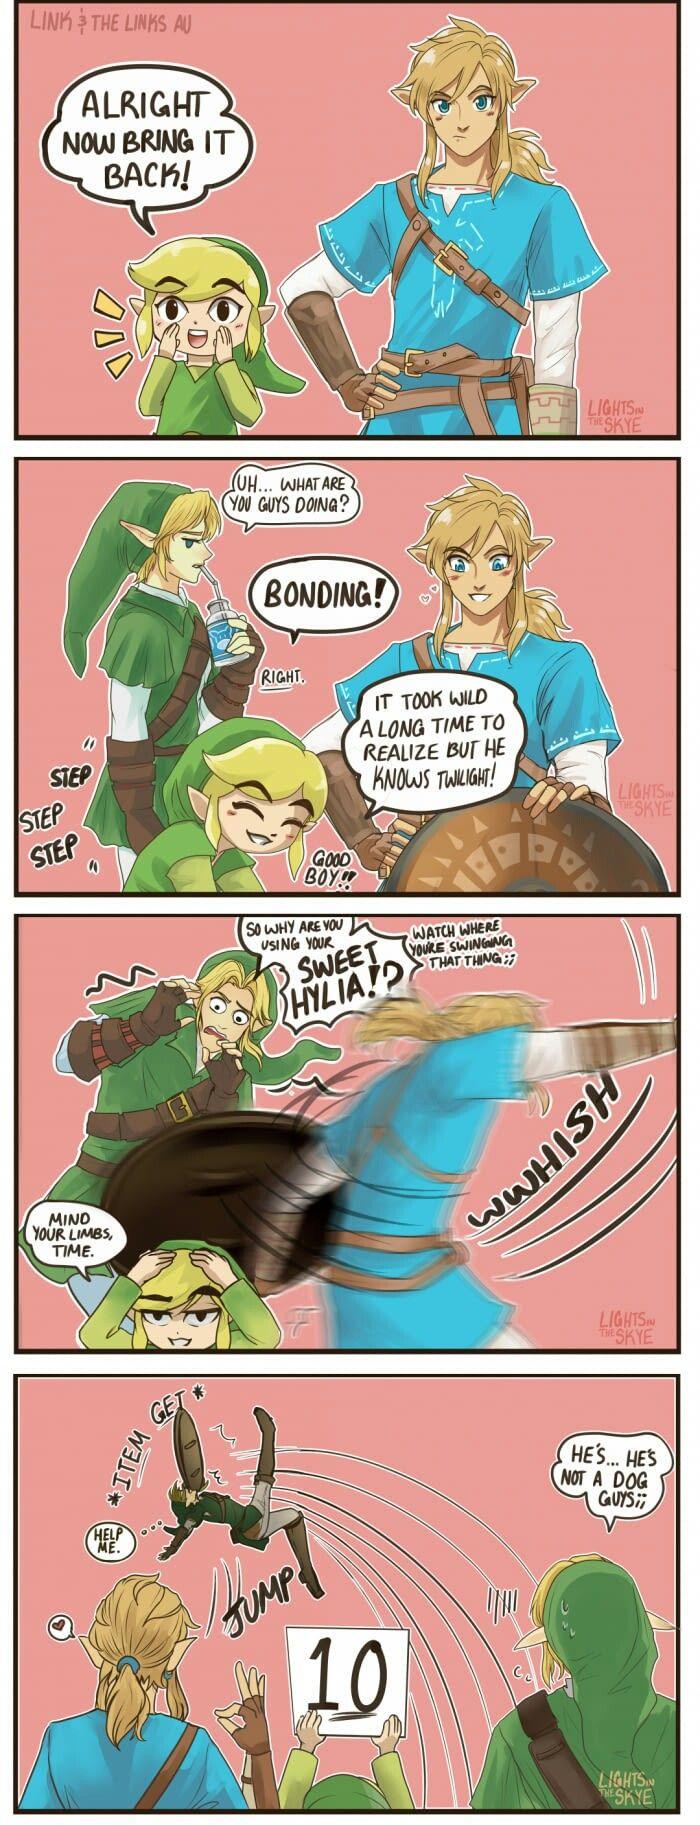 Toon Link, Botw Link and Twilight Link